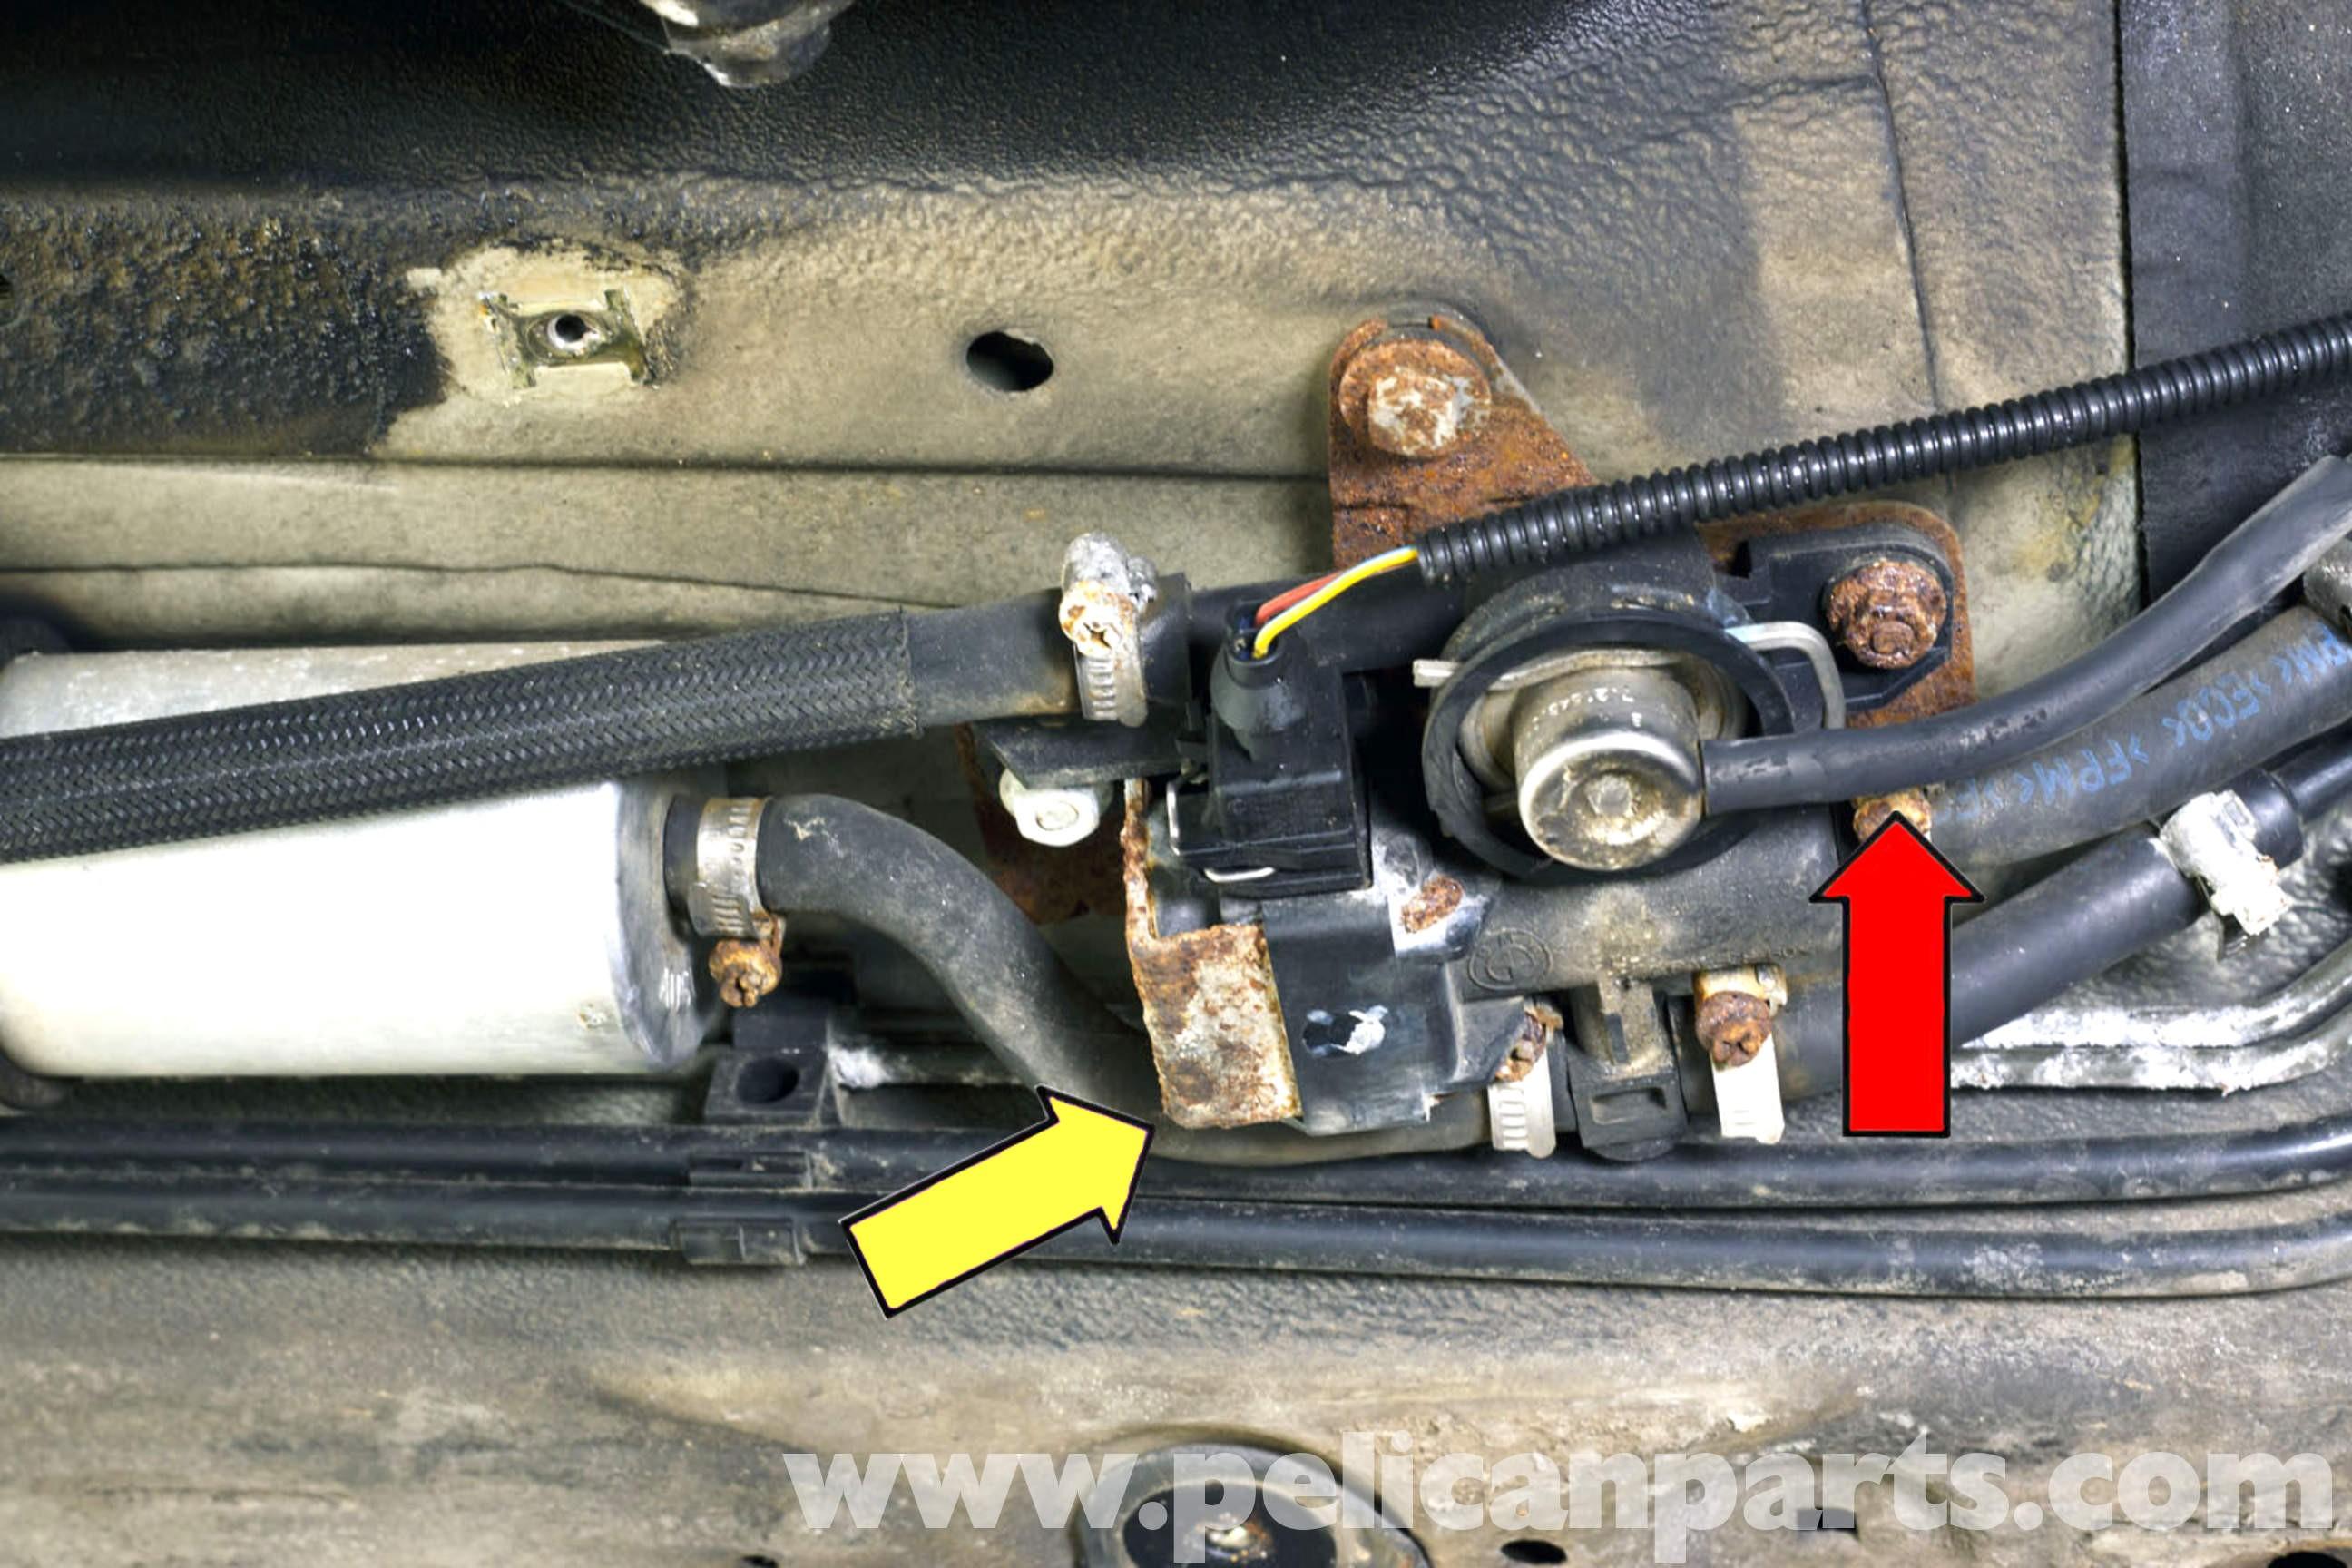 2003 Bmw 325i Engine Diagram Bmw 740i Engine Diagram Another Blog About Wiring Diagram • Of 2003 Bmw 325i Engine Diagram